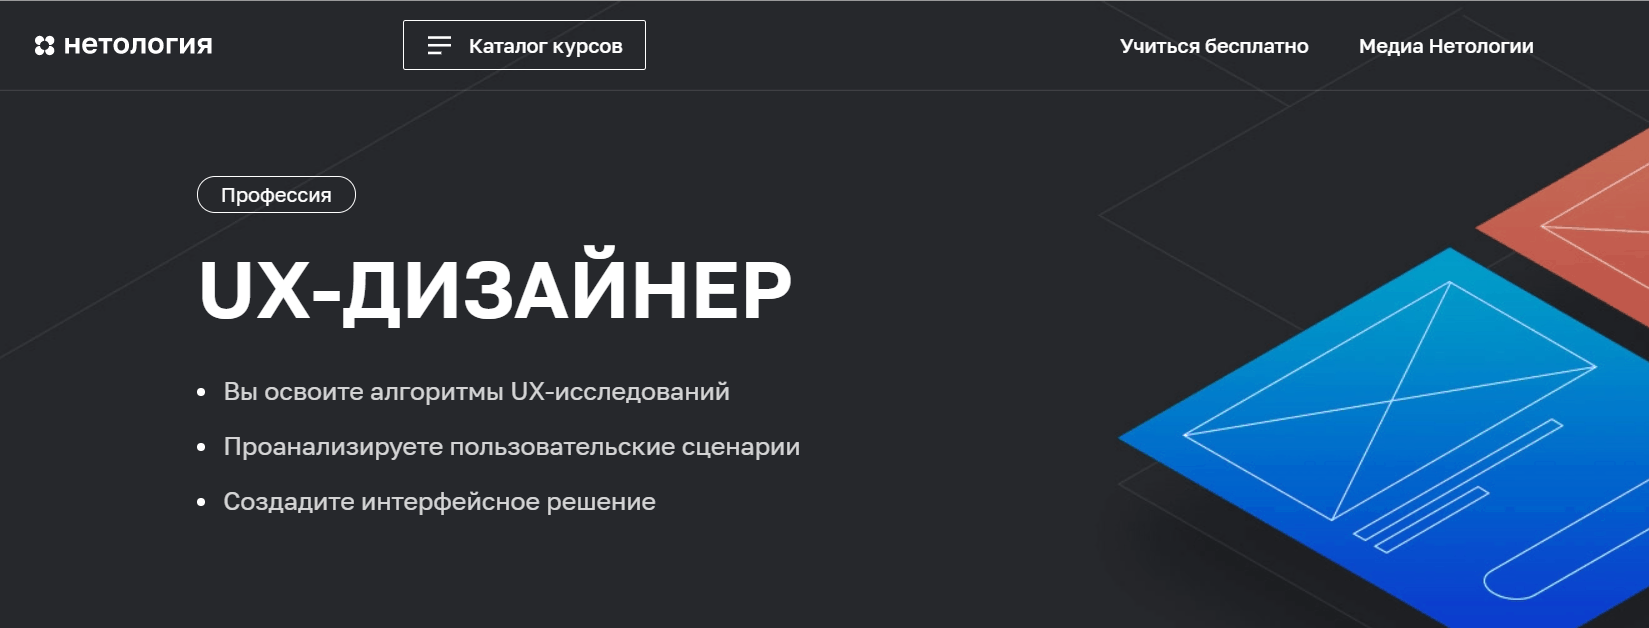 UX-дизайнер — профессия от Нетологии